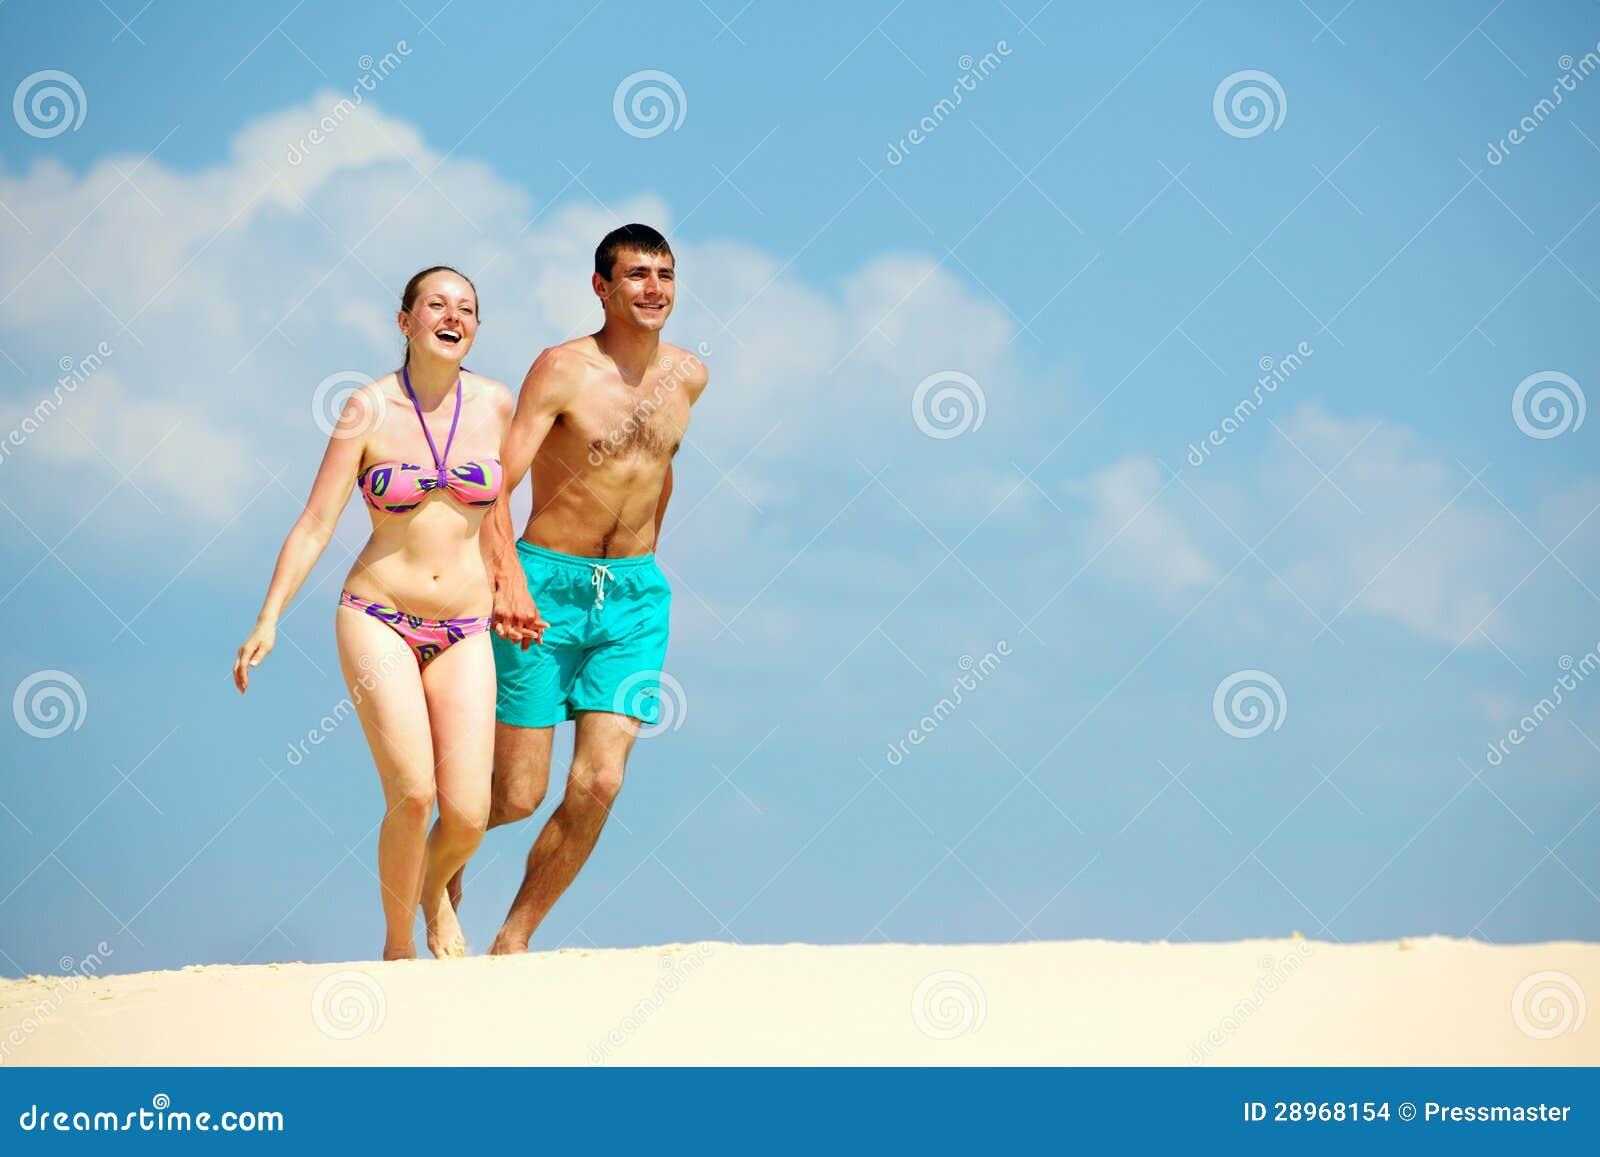 Plaża dla dwa